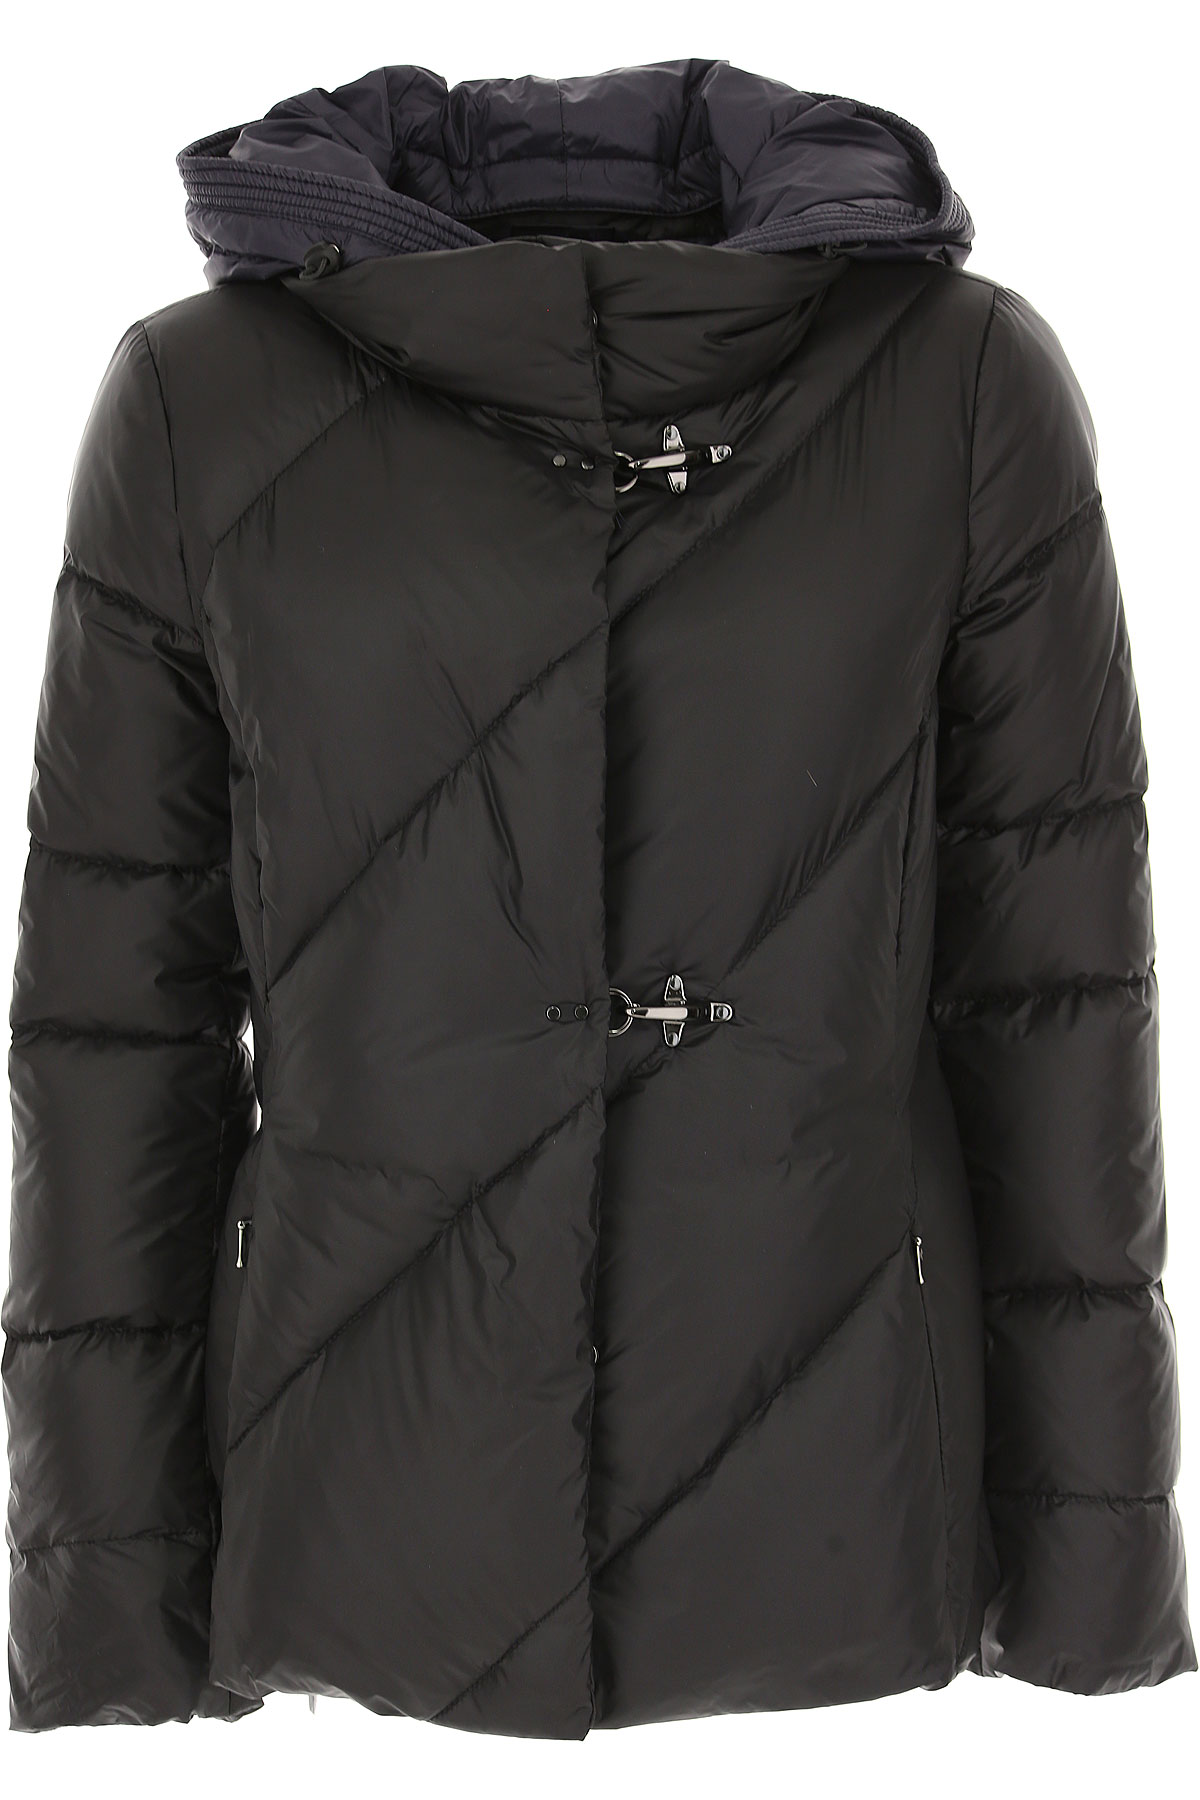 Fay Down Jacket for Women, Puffer Ski Jacket On Sale, Black, Down, 2019, 10 8